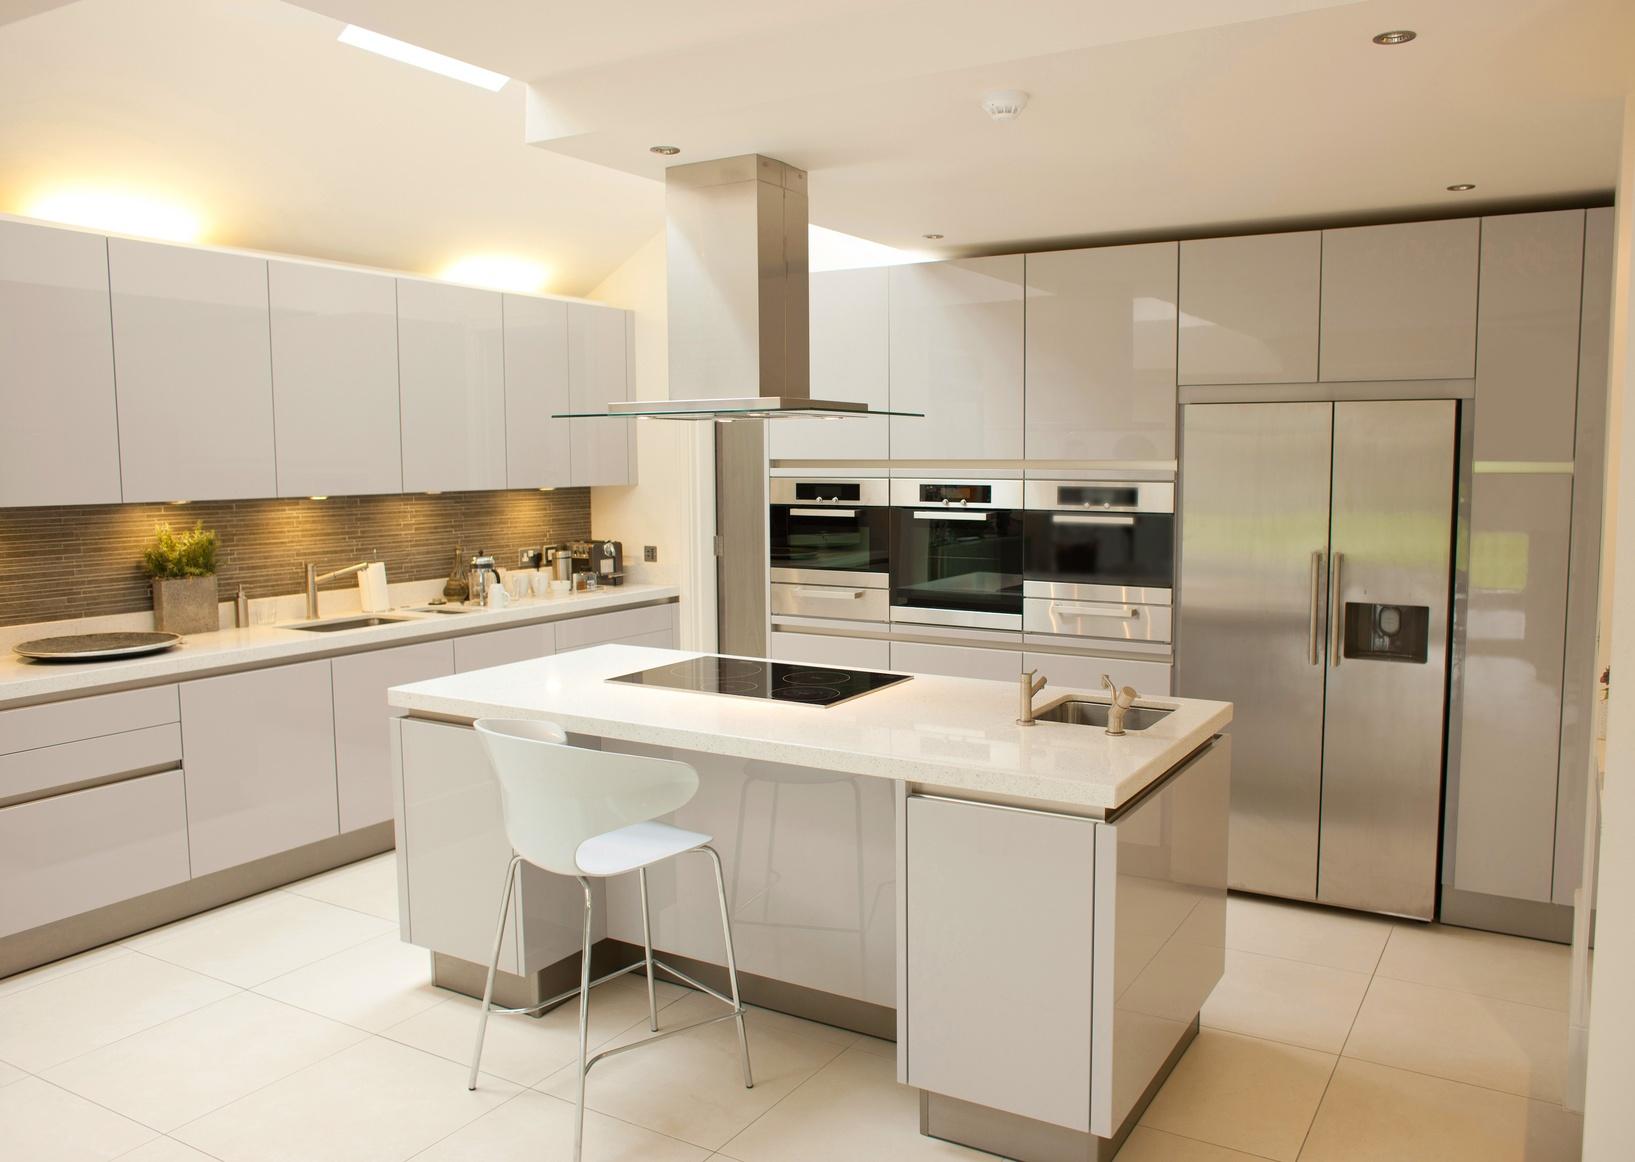 muebles de cocina bordon tenerife ideas